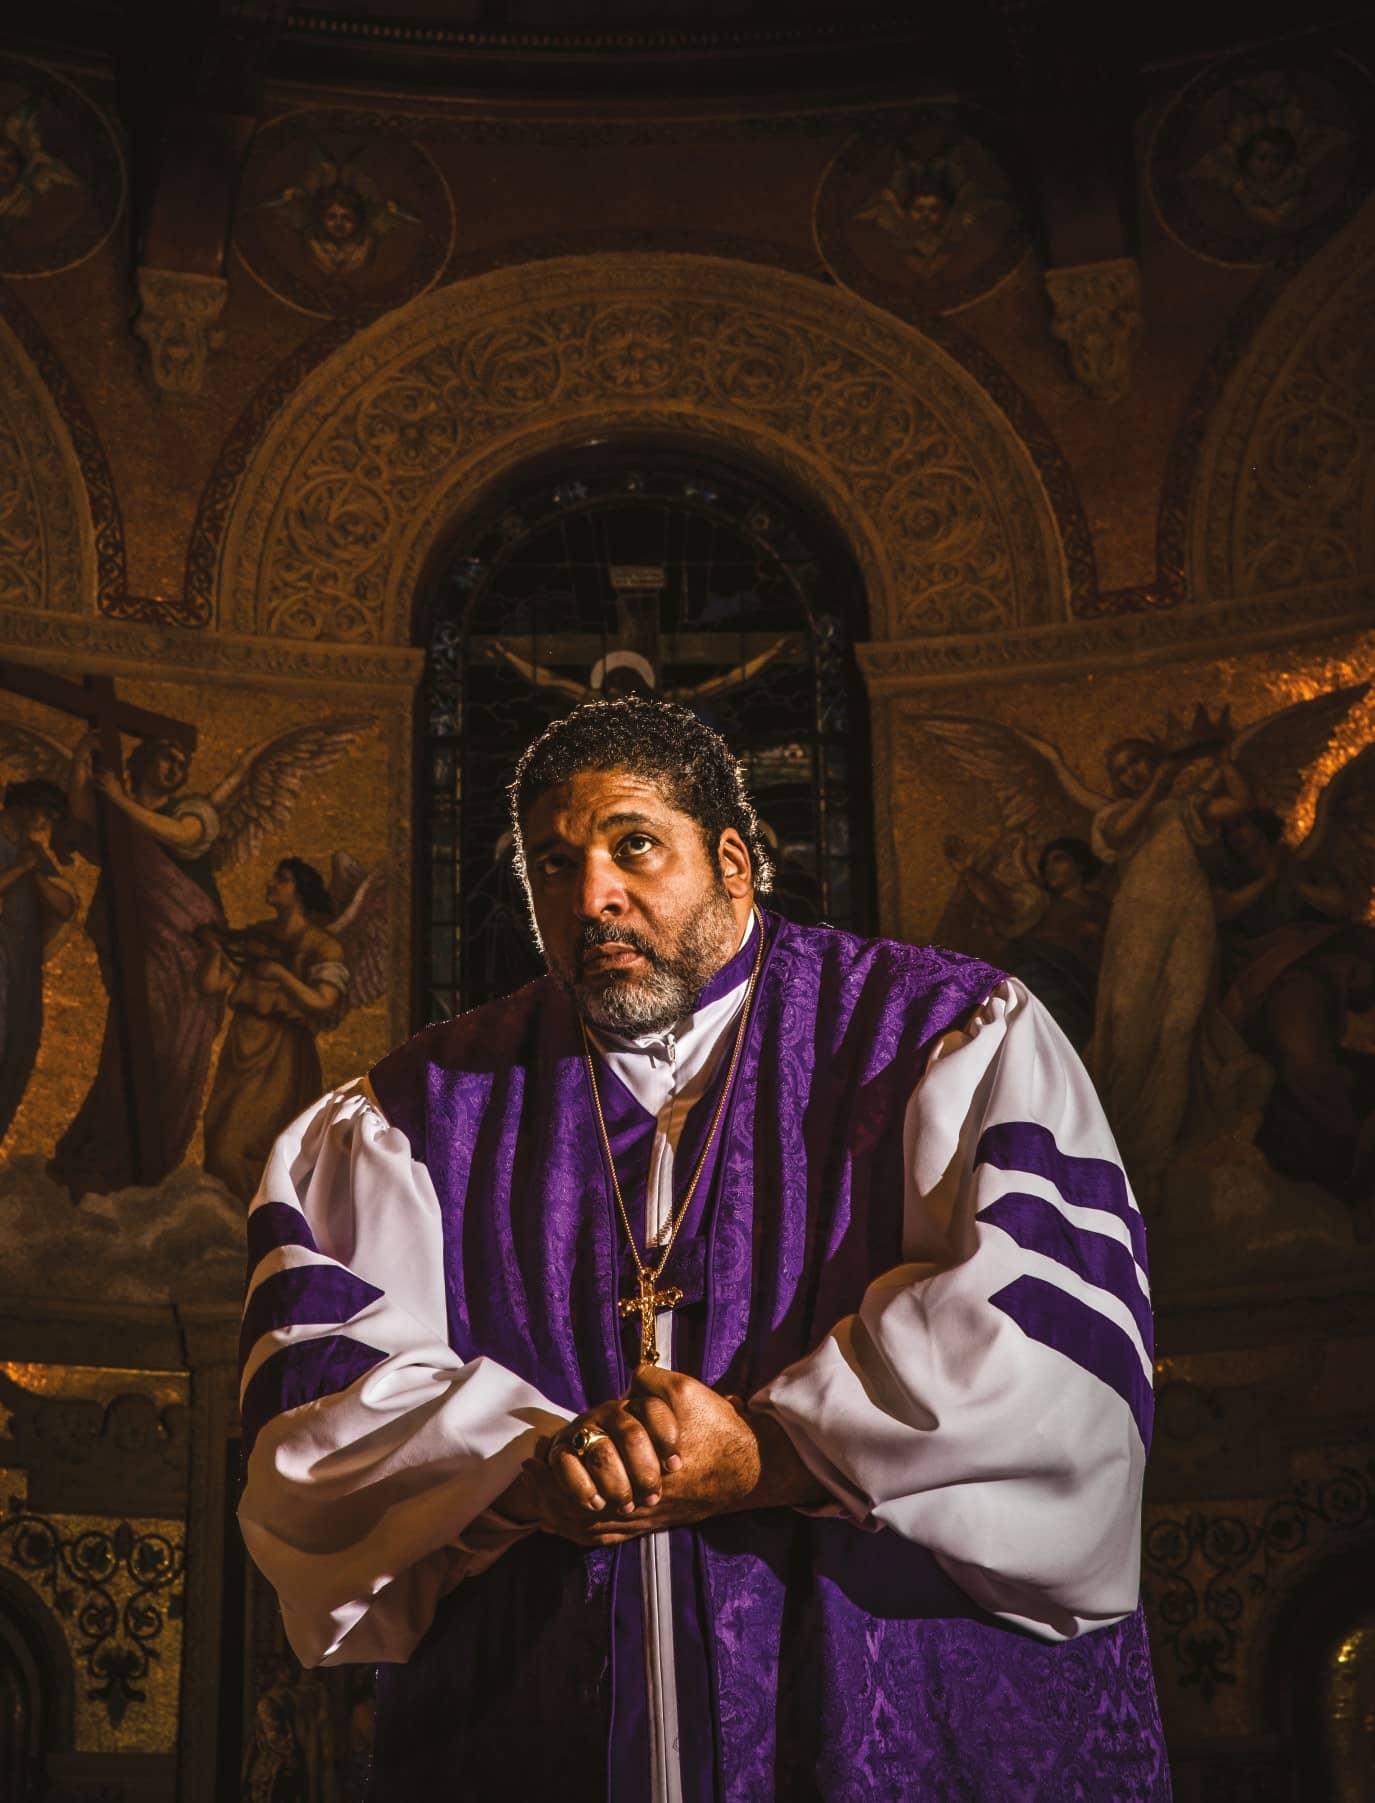 Man In His Domain The Reverend William J. Barber II